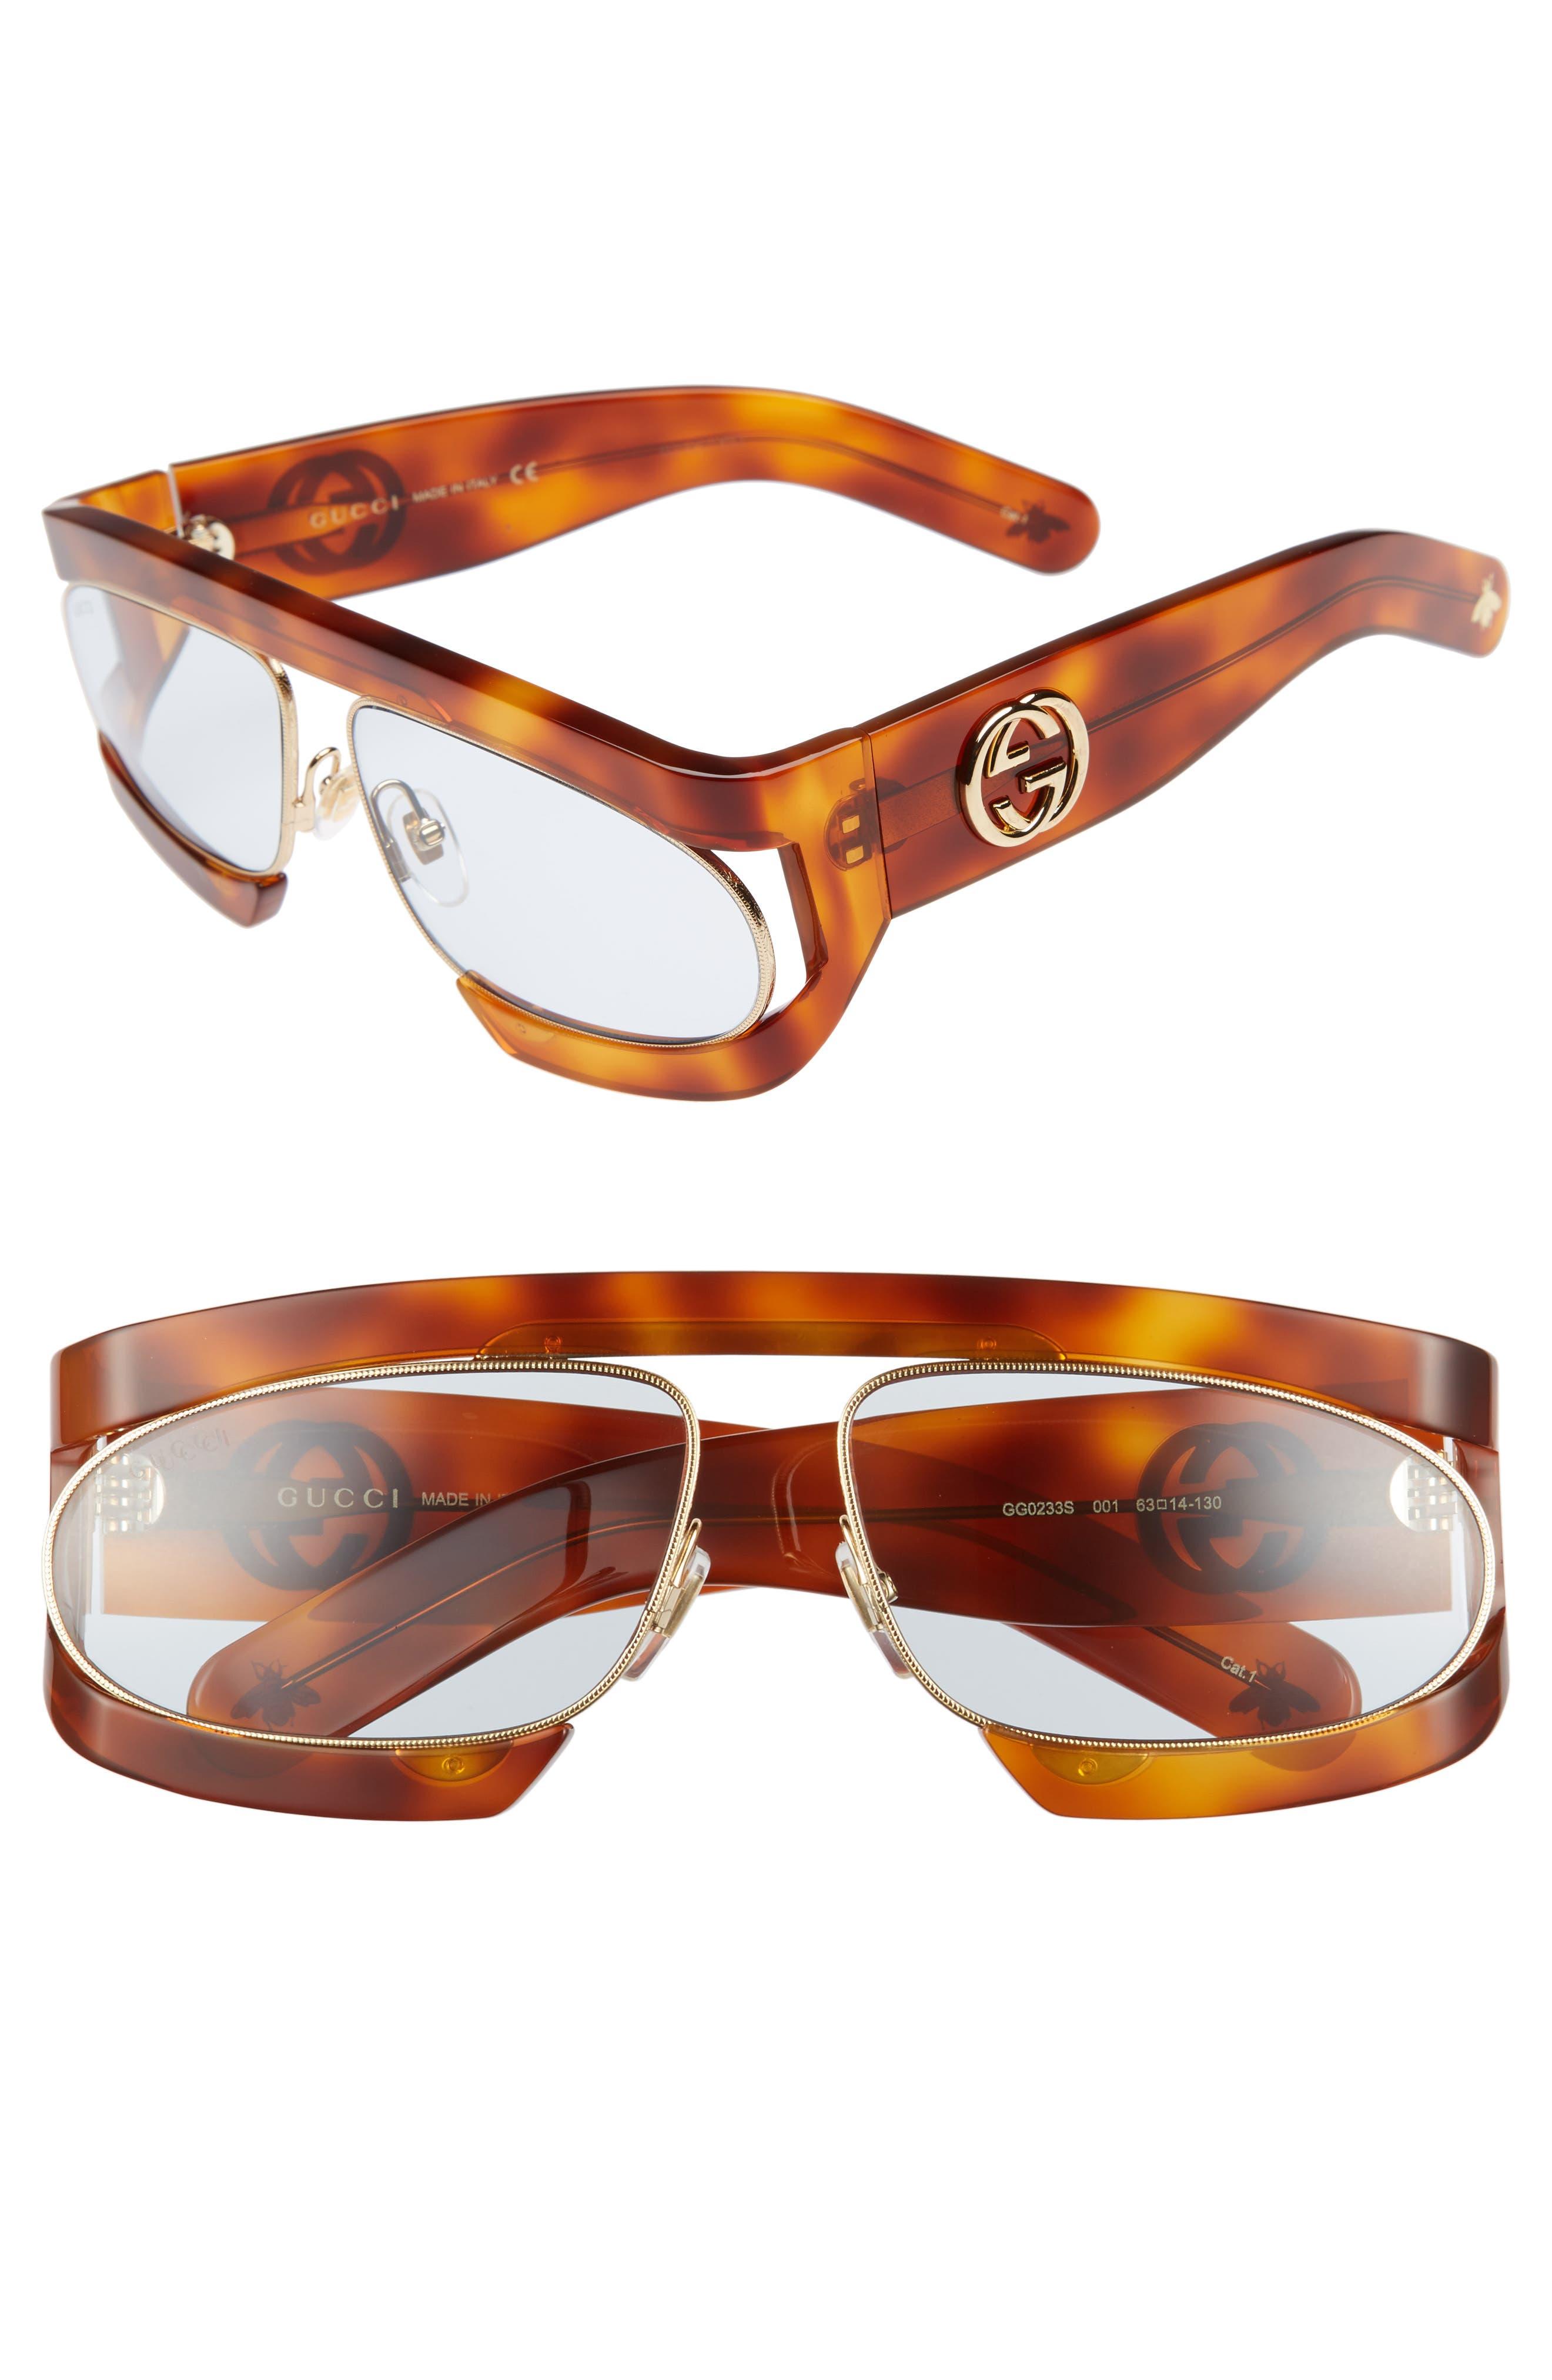 63mm Shield Glasses,                         Main,                         color, 200